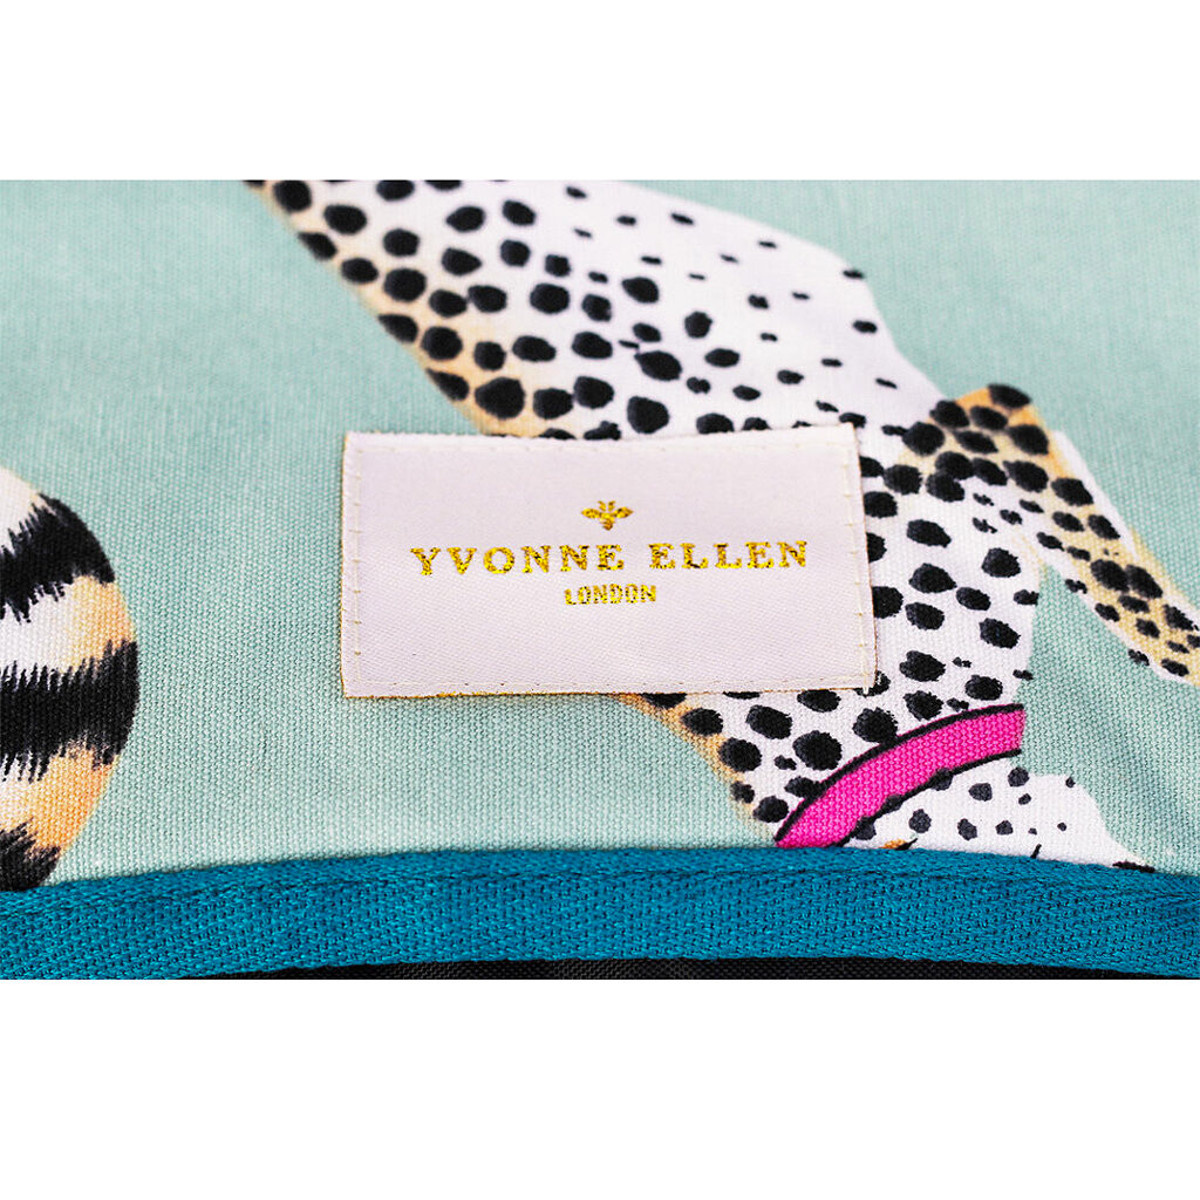 Yvonne Ellen London Yvonne Ellen PICNIC Cheeky Cheetahs Picknick Decke 145 x 140 cm